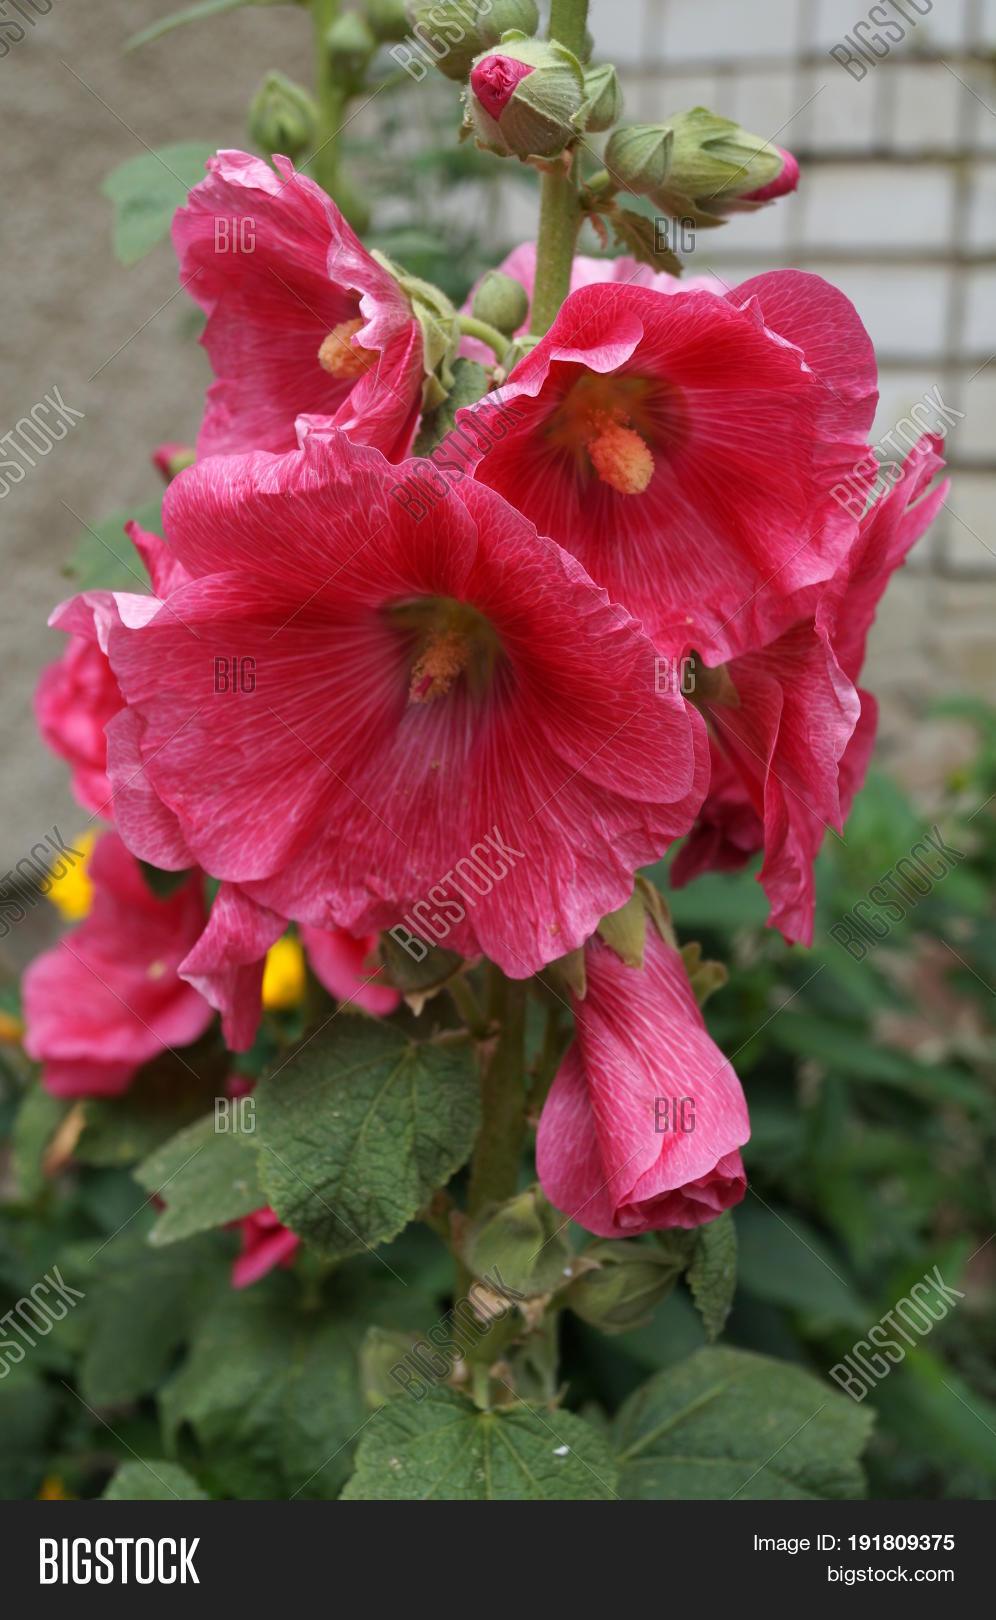 Malva Red Flowers Image Photo Free Trial Bigstock